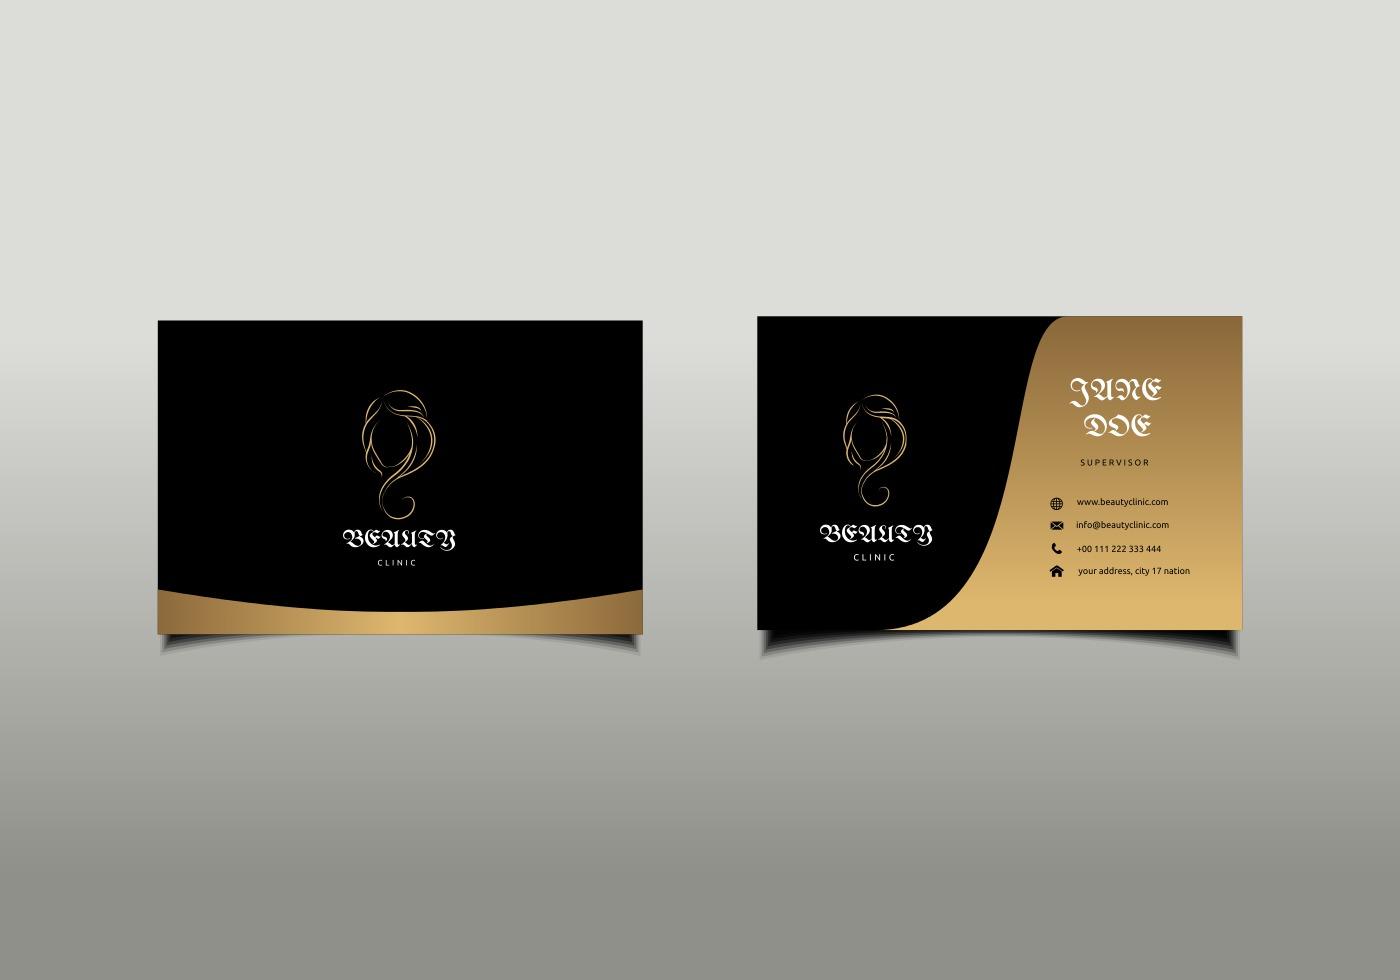 Business Card Mockup Vektor Kostenlos 1 276 Gratis Downloads